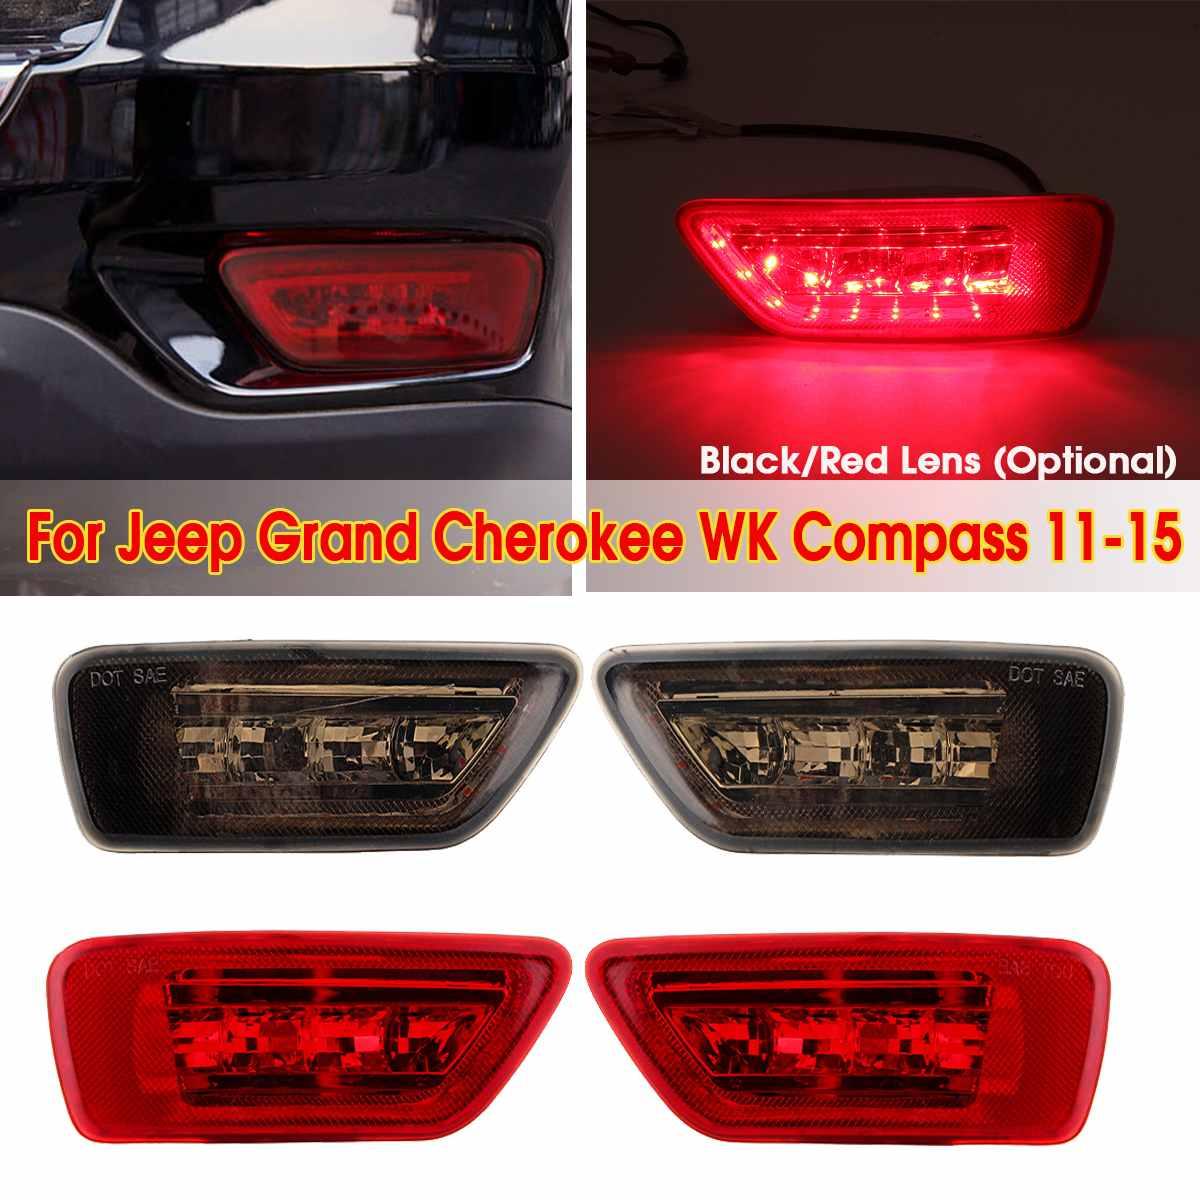 2pcs LED Rear Bumper Fog Marker Rear Lights Tail Brake Fog Lamp For Jeep Grand Cherokee